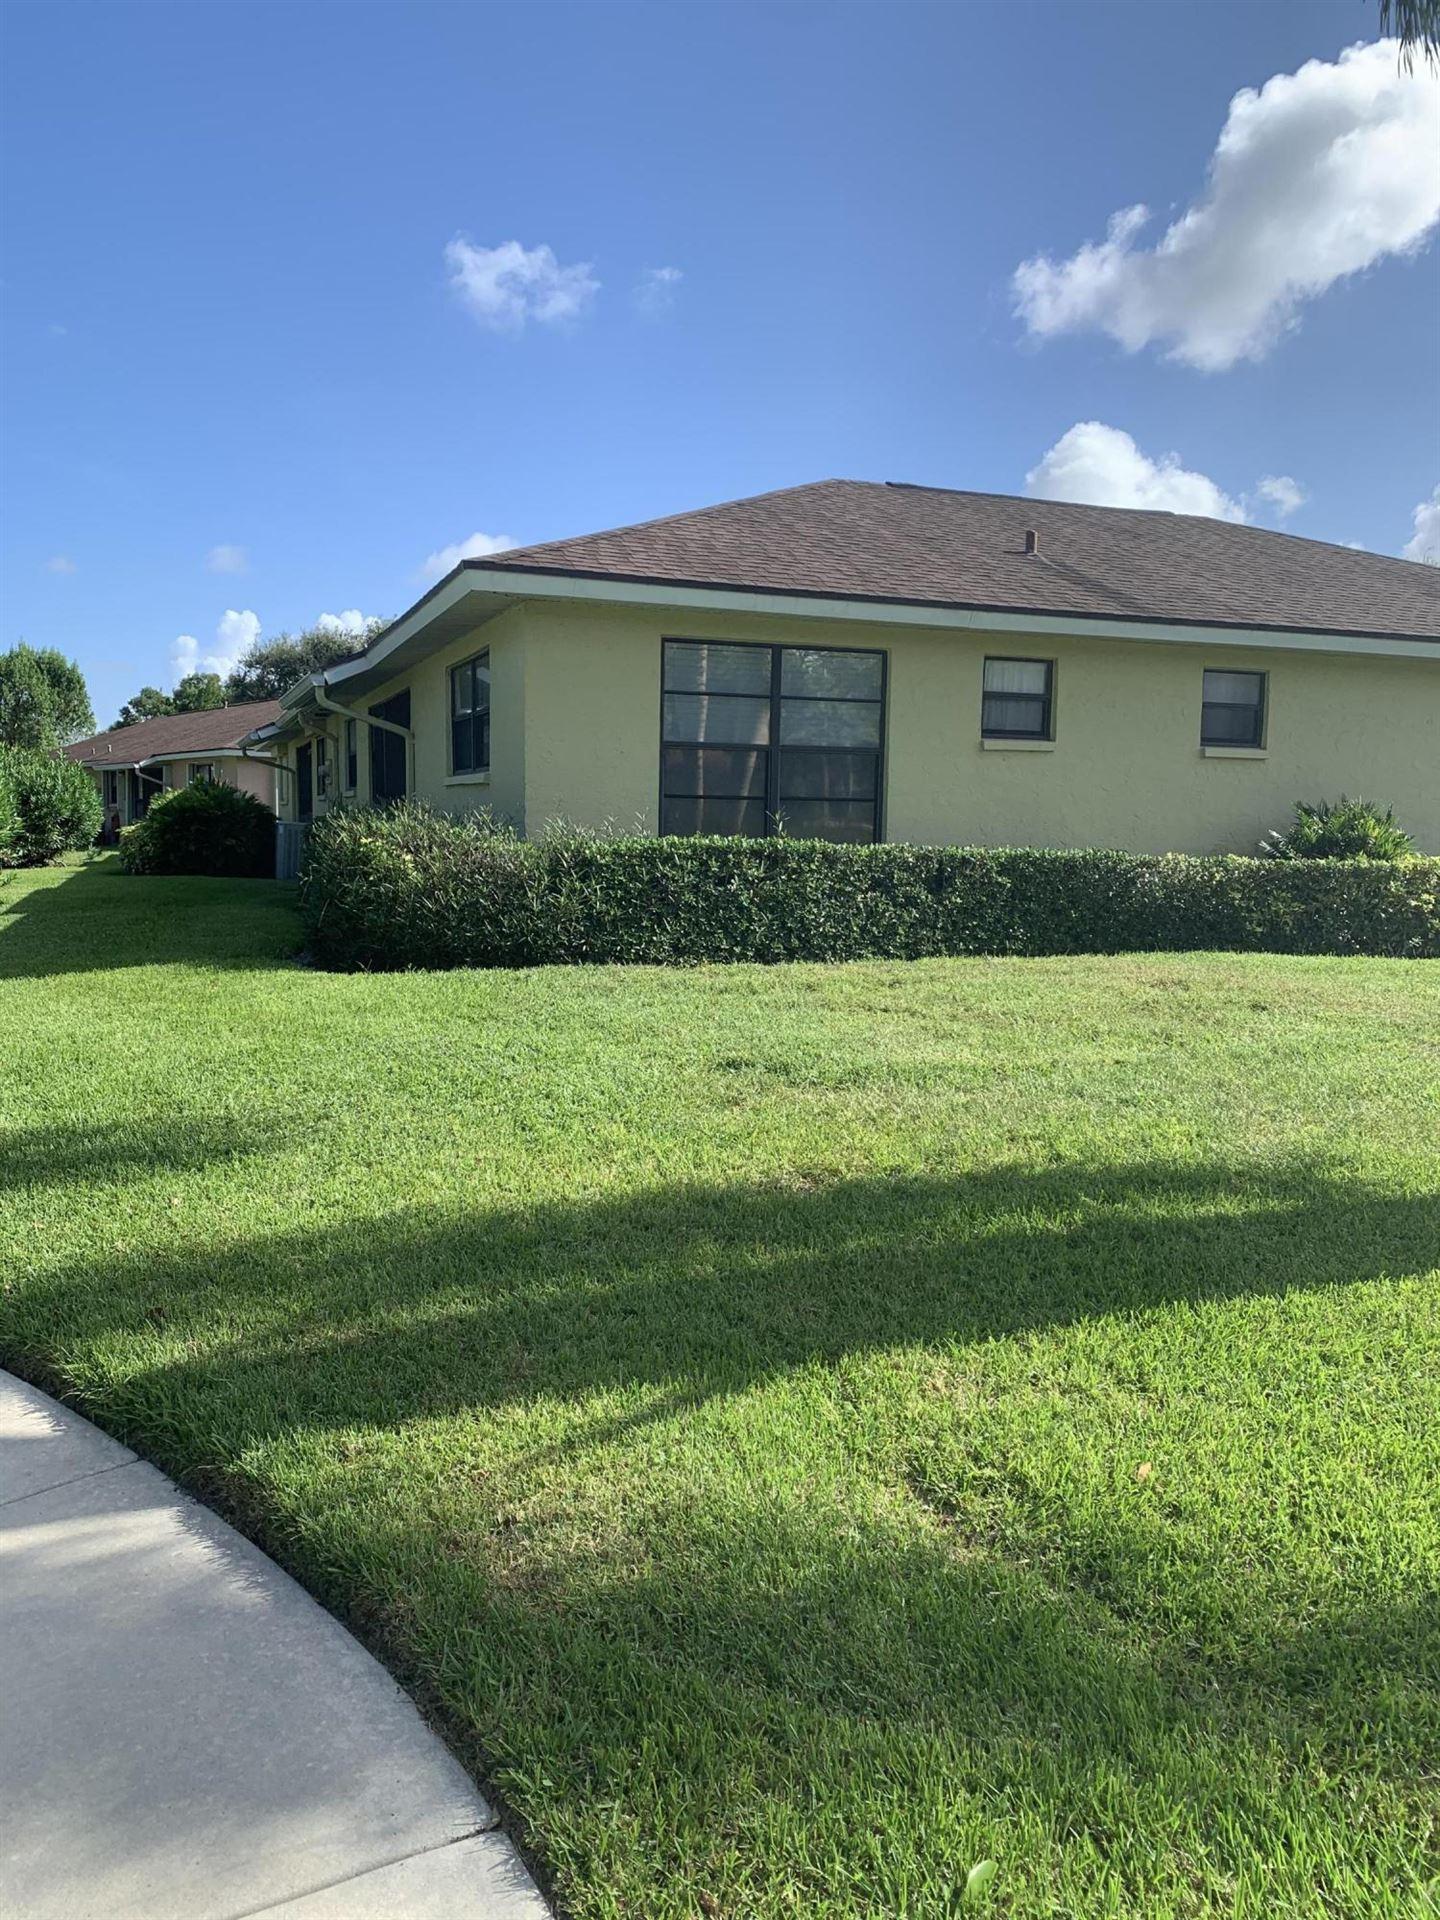 Photo of 9885 Pecan Tree Drive #A, Boynton Beach, FL 33436 (MLS # RX-10651239)